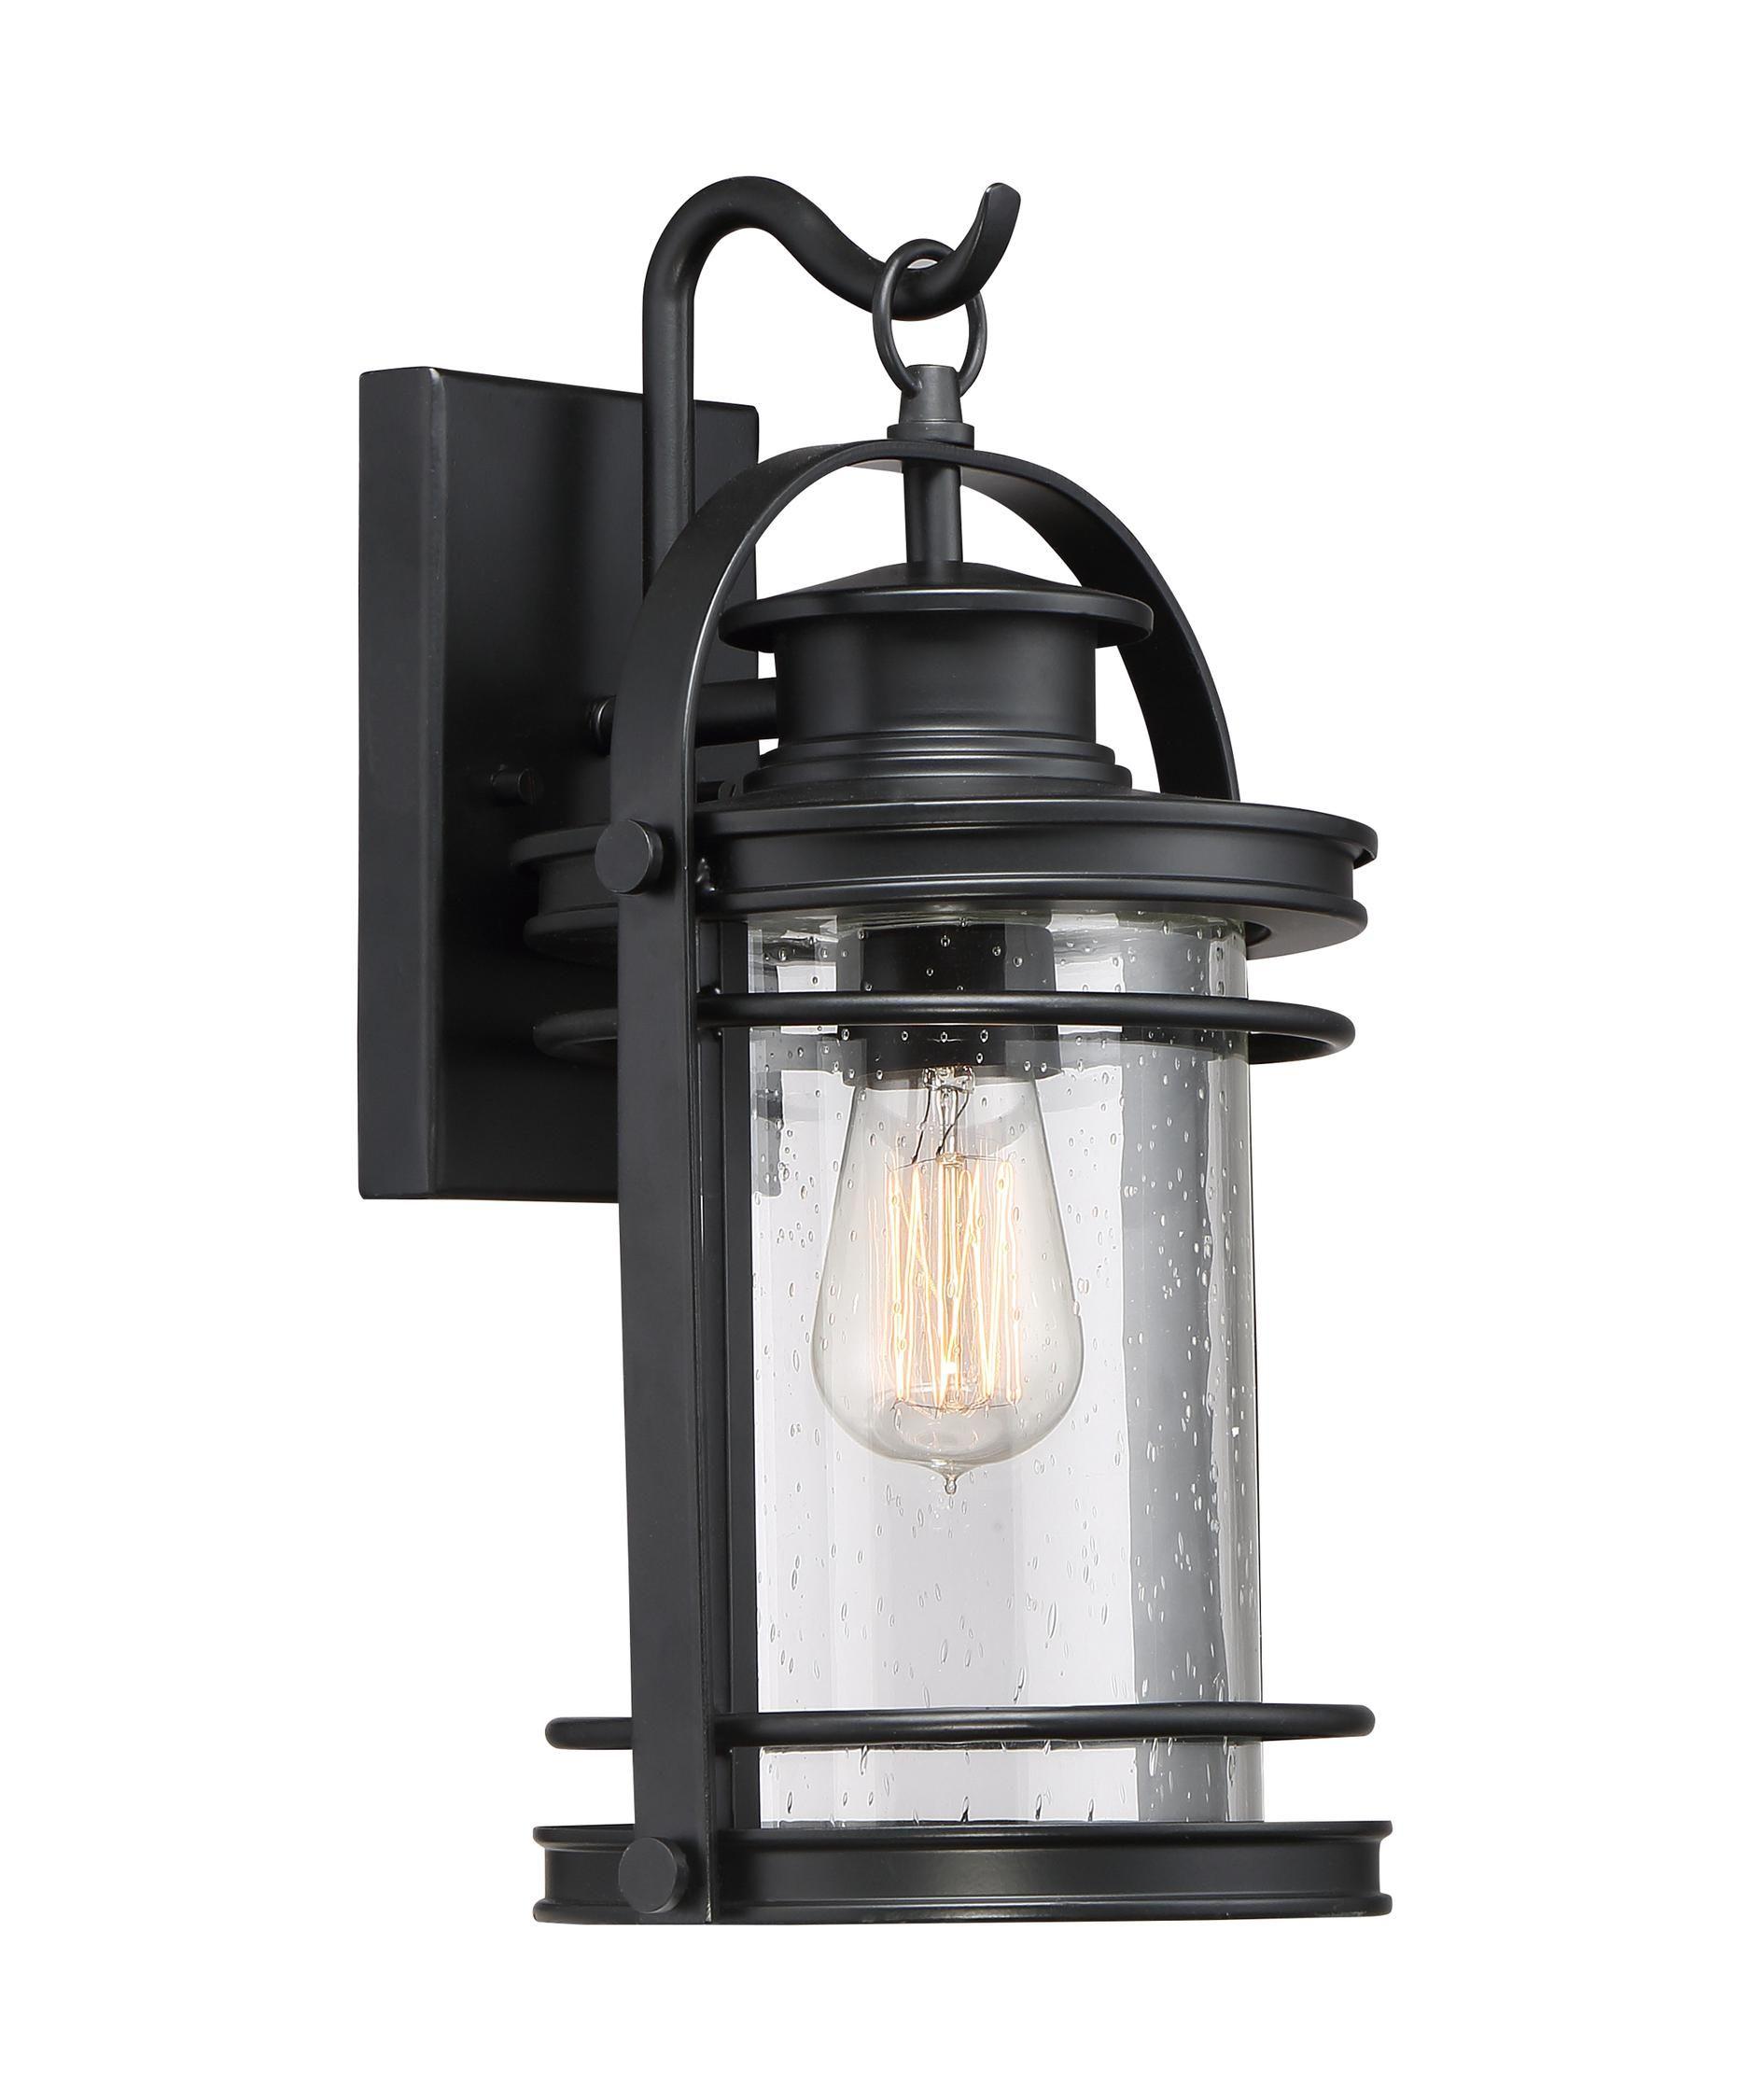 Quoizel Bkr8408 Booker 1 Light Outdoor Wall Light $199